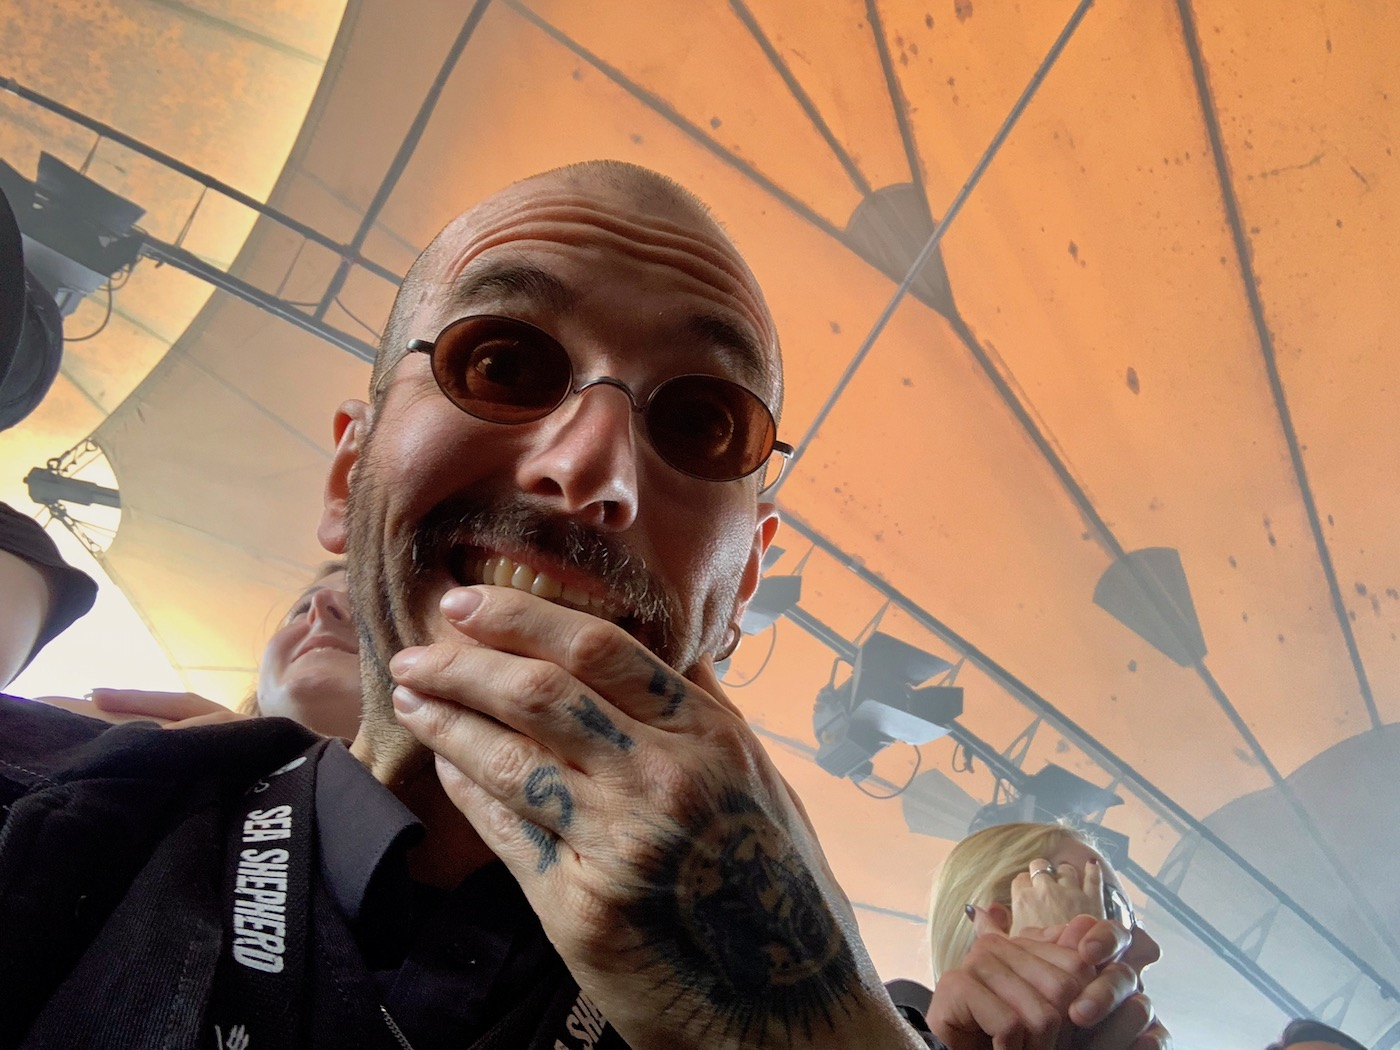 mark_benecke_amphi_festival_koeln_2019 - 49.jpg